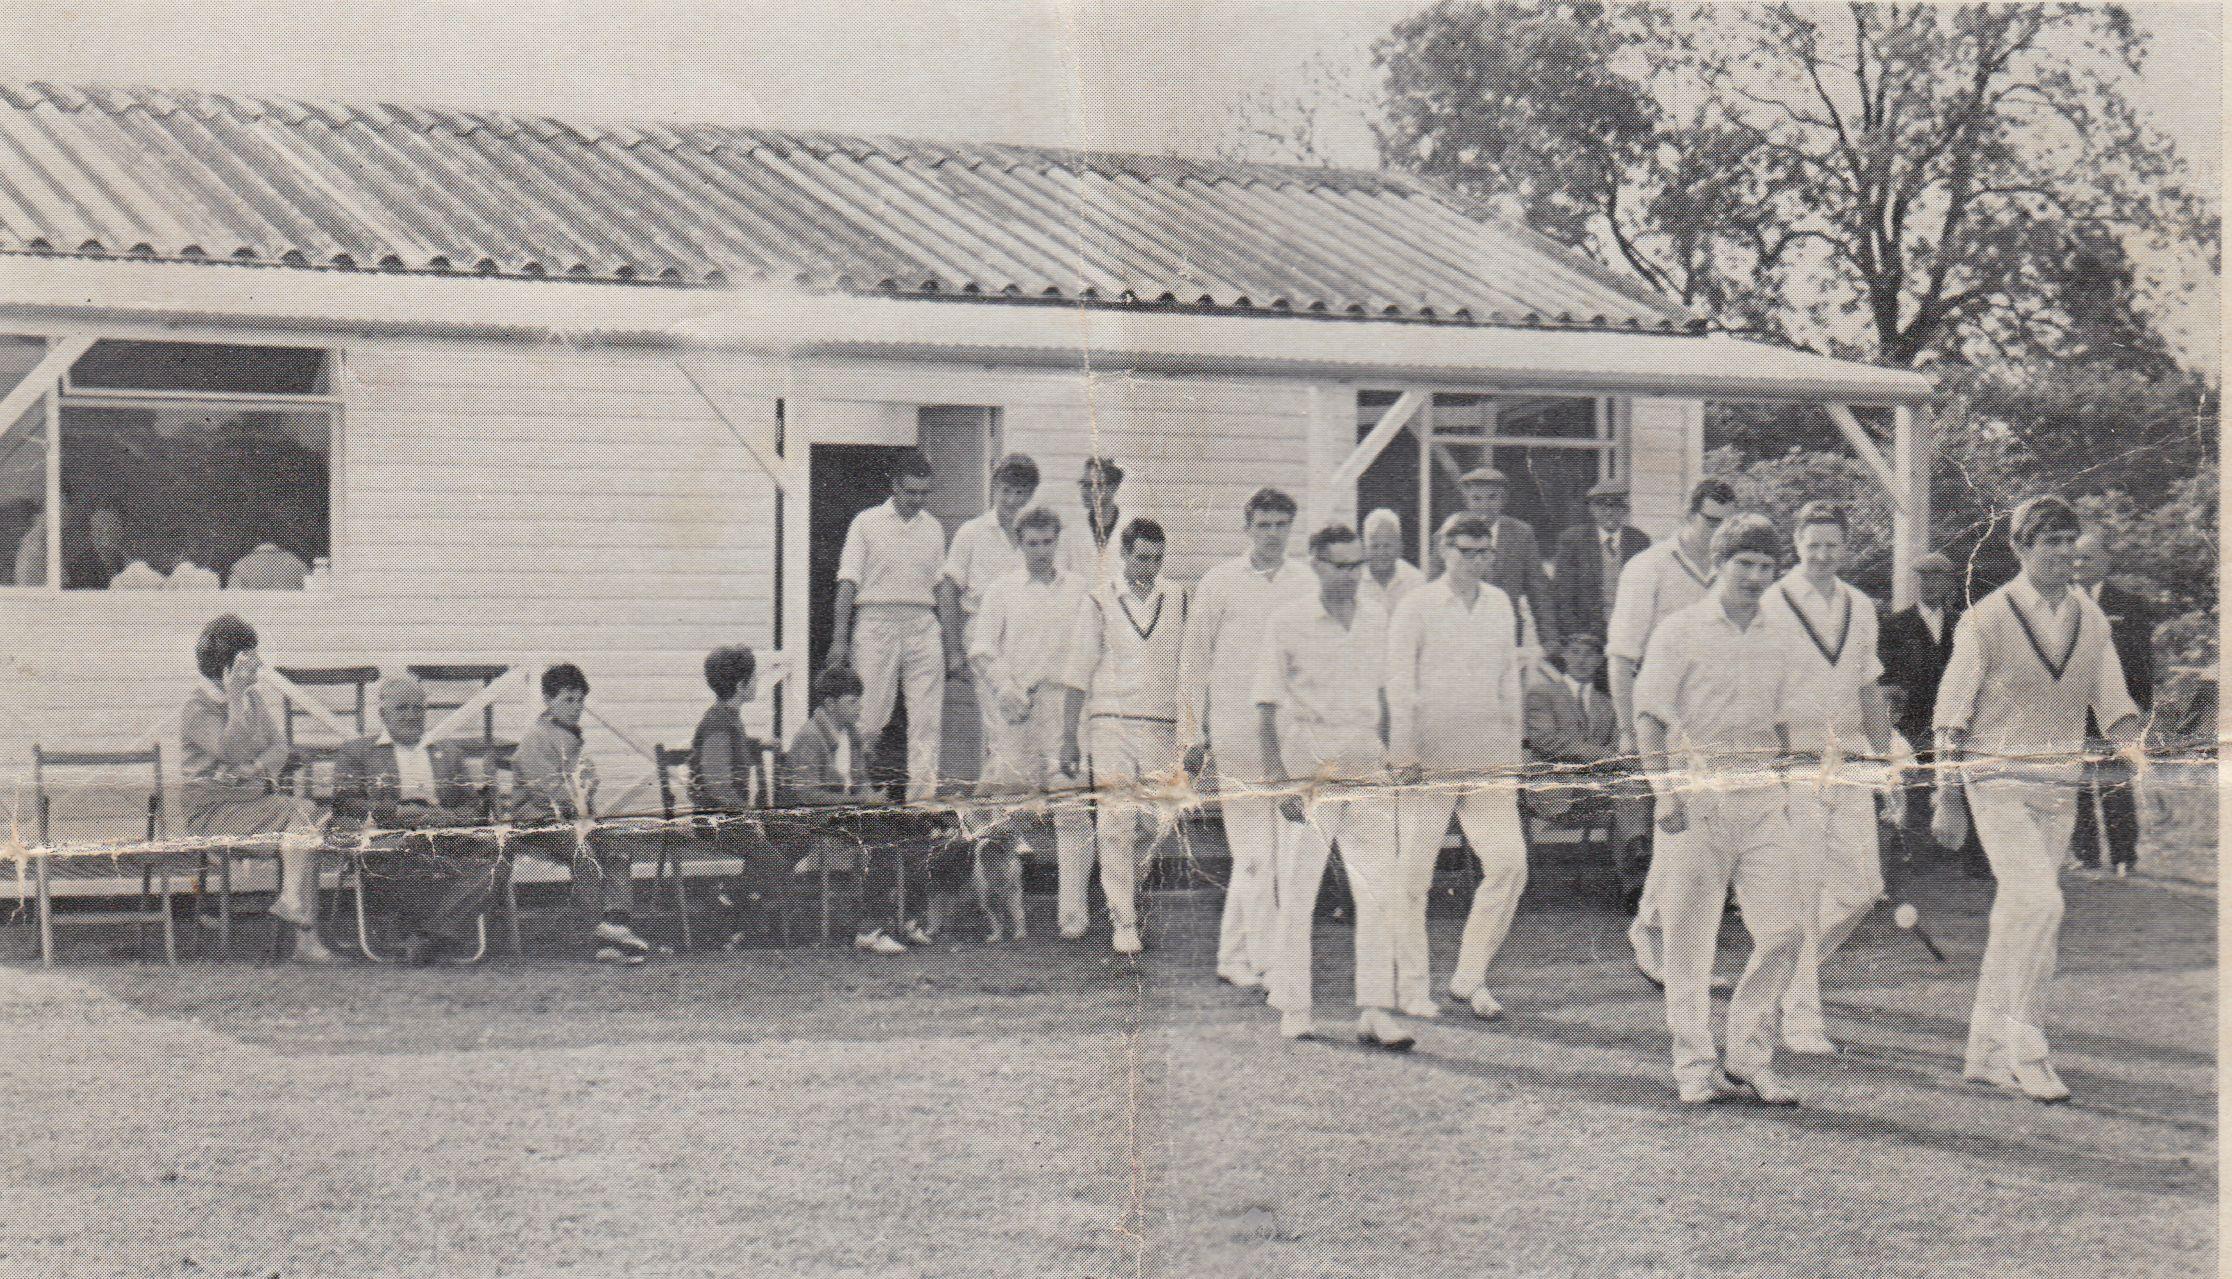 cricket_pavilion_team_walking_out_0001.jpg